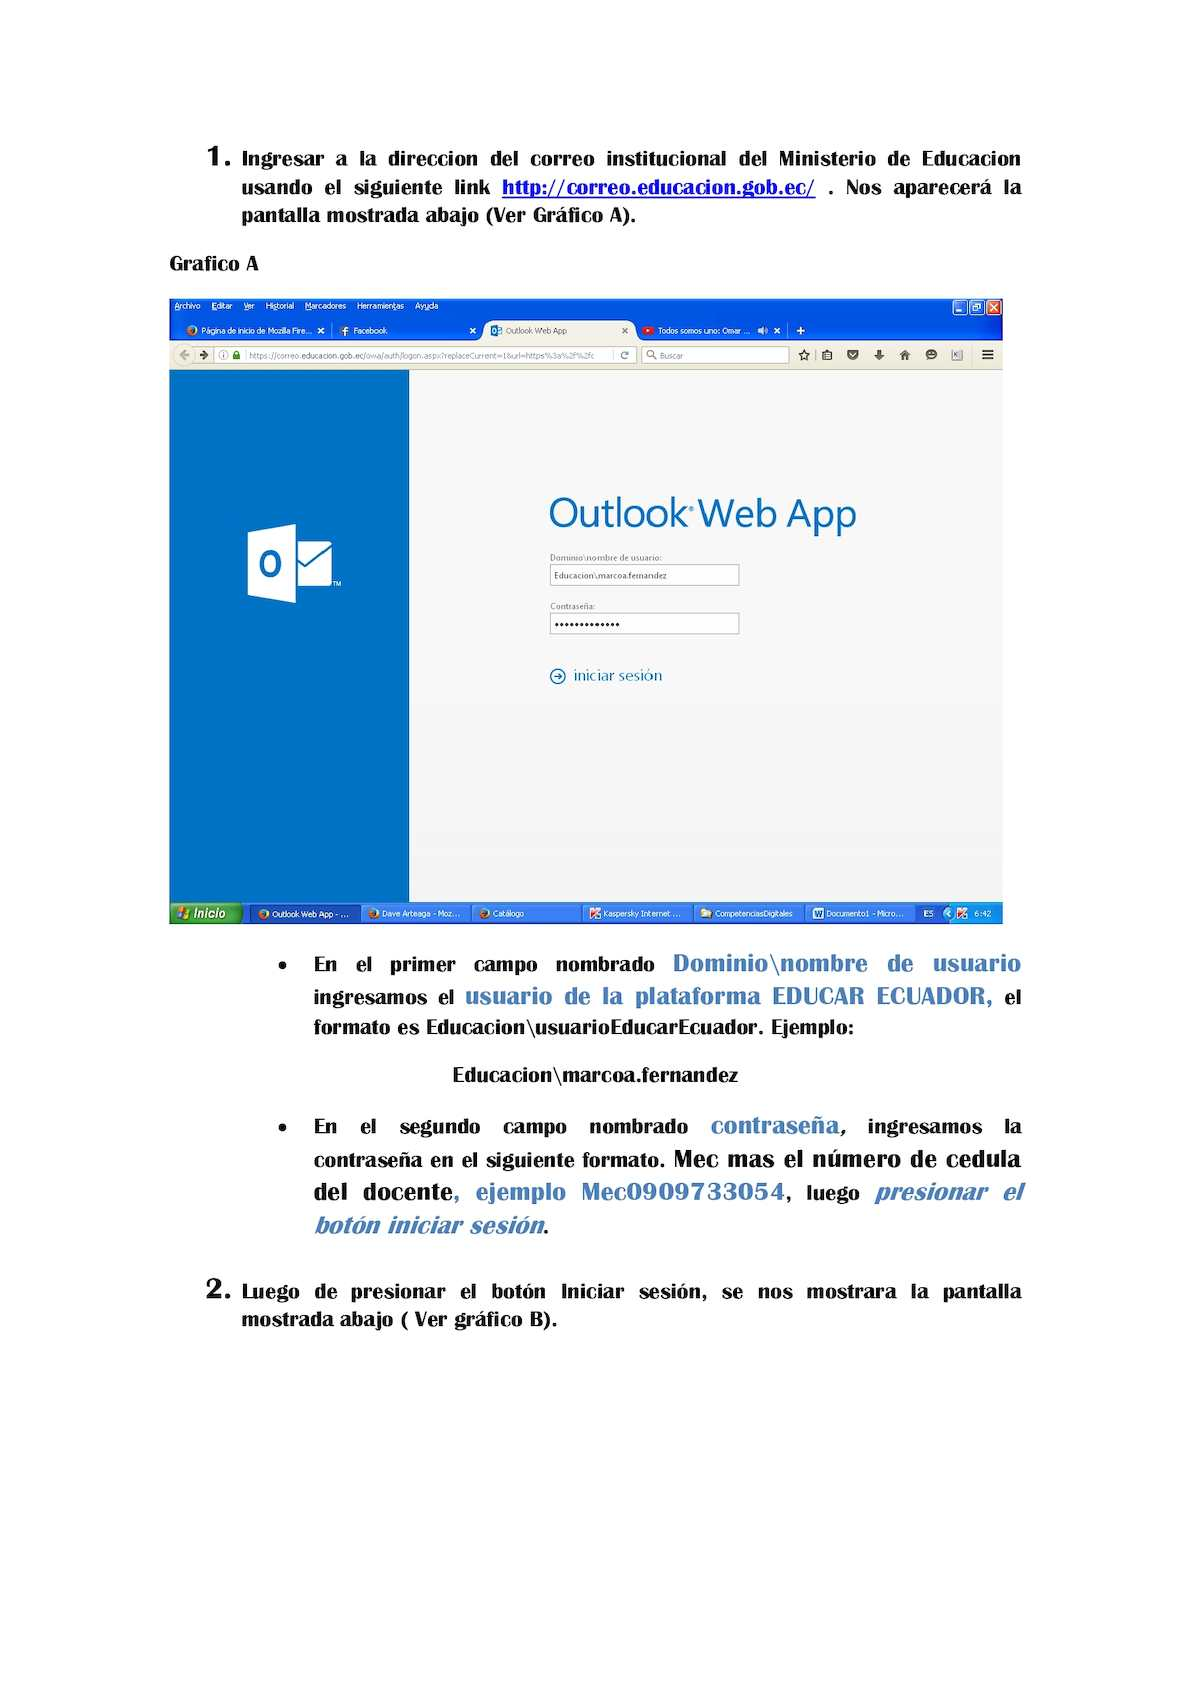 correo institucional educacion gob ec outlook web app